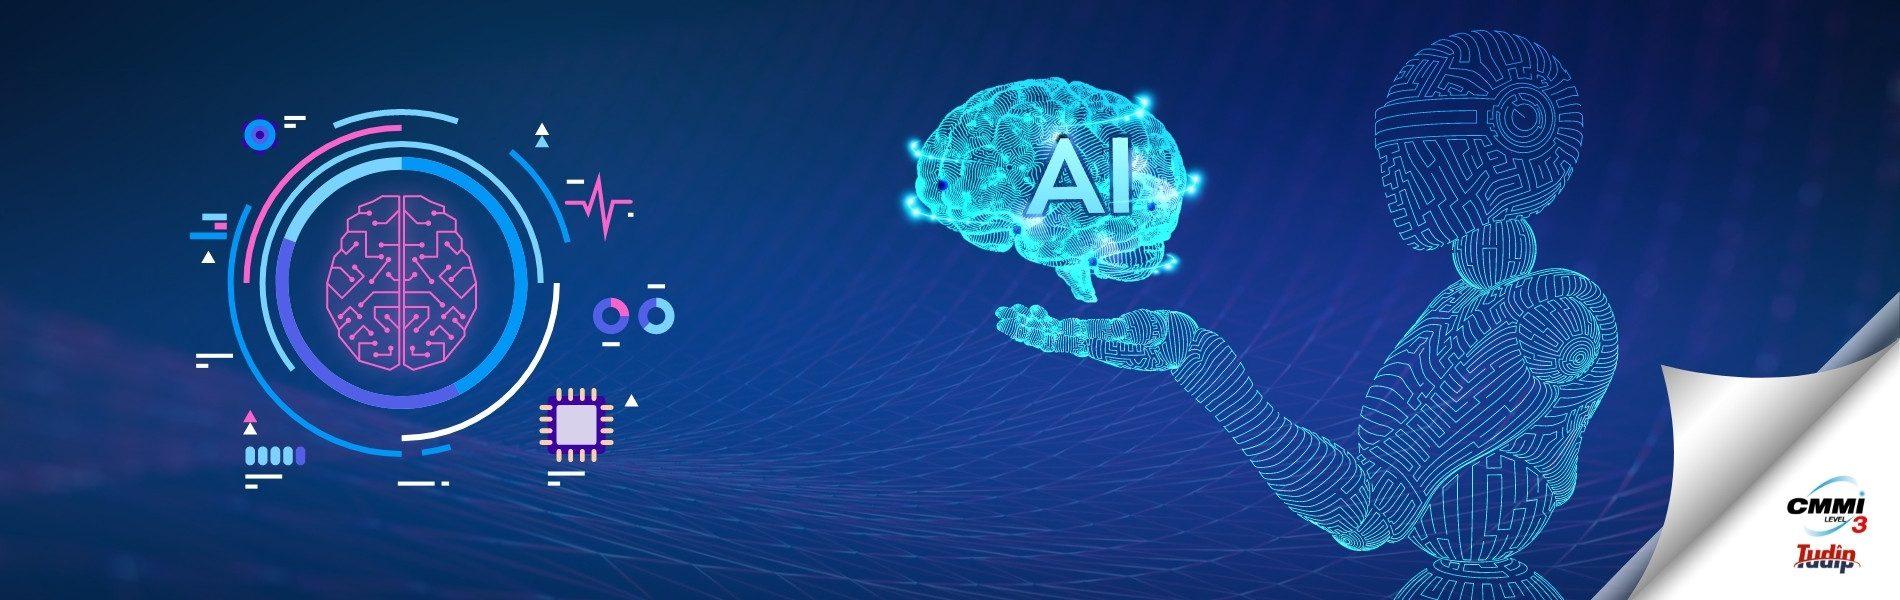 AI & ML evolving digital transformation